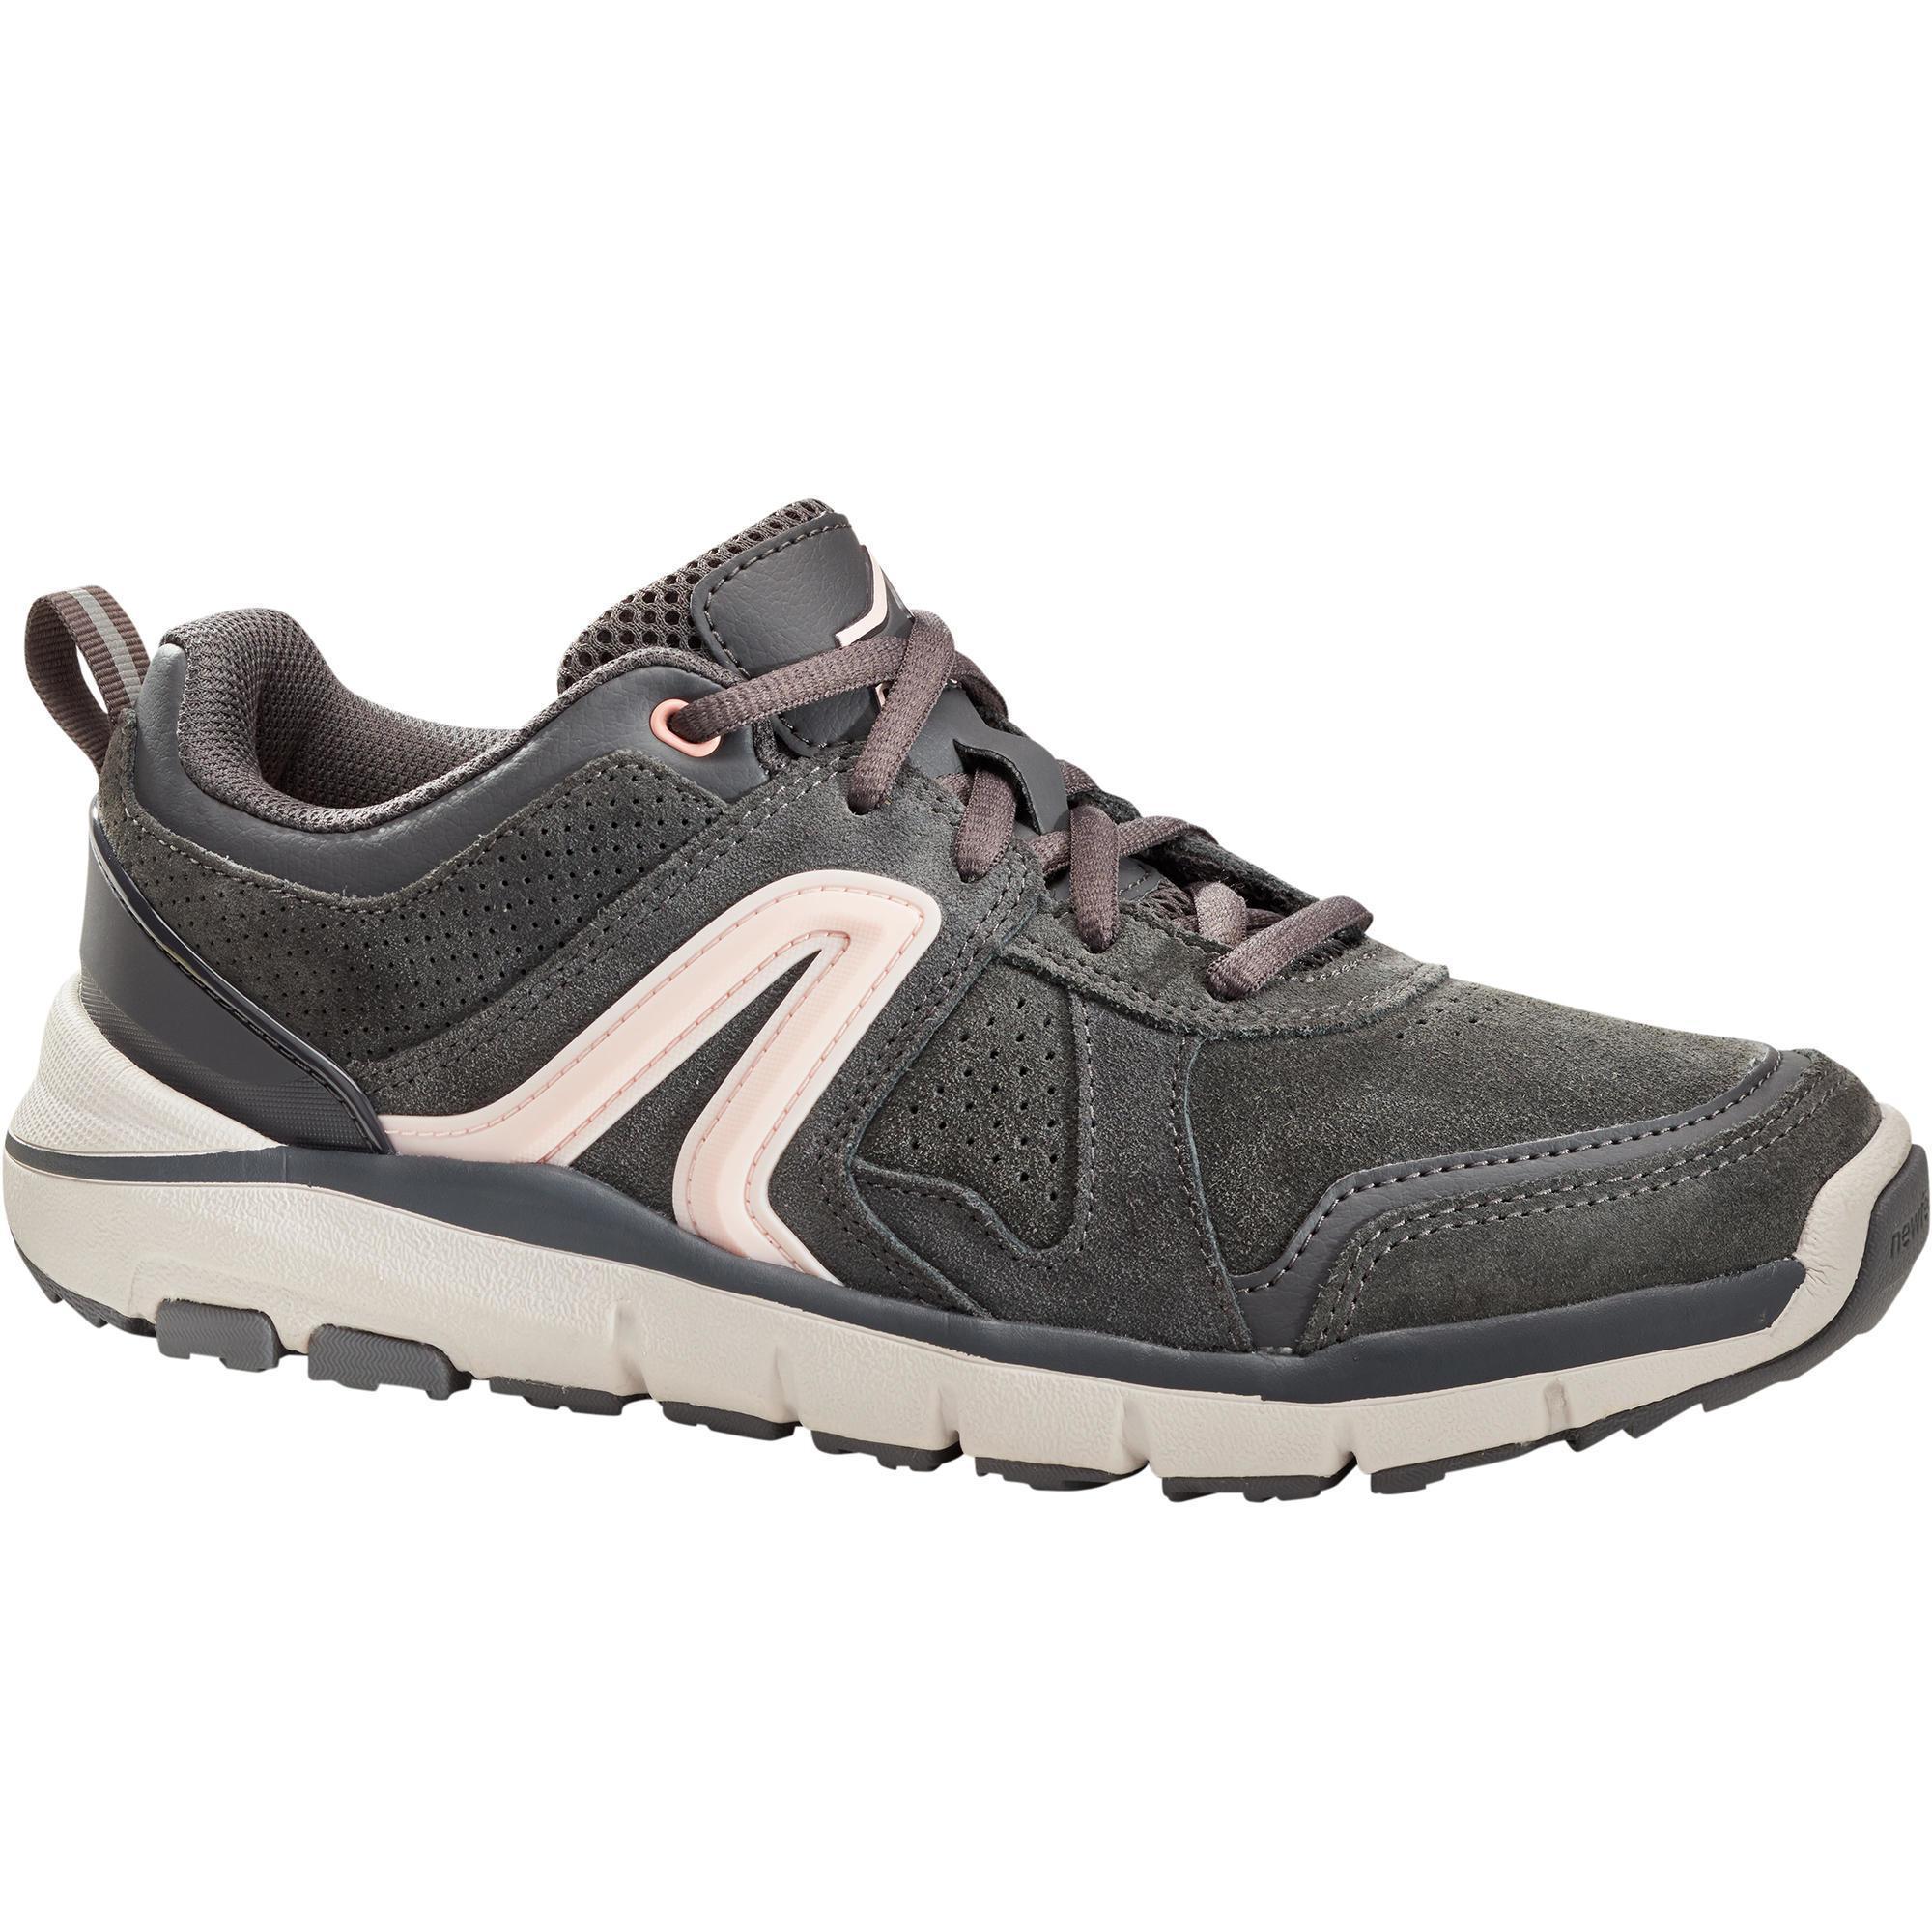 Newfeel Chaussures marche sportive femme HW 540 cuir gris foncé - Newfeel